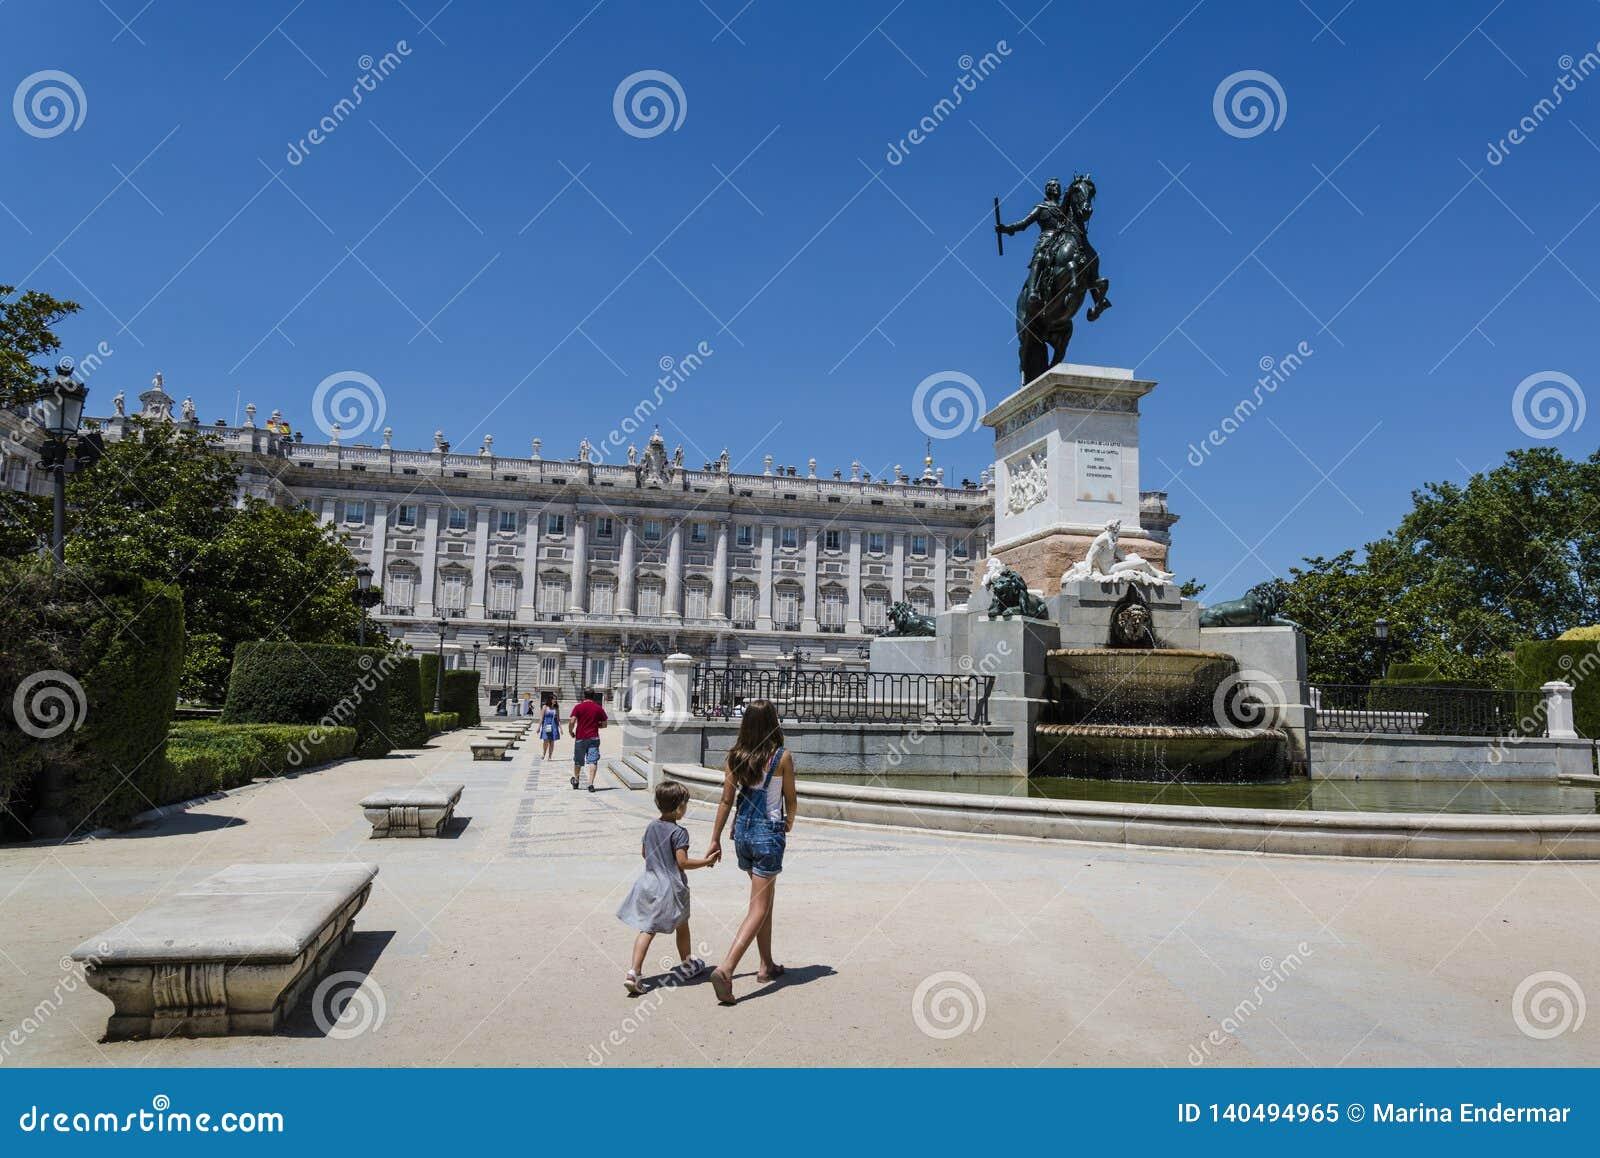 Plaza de Oriente, Madrid, España